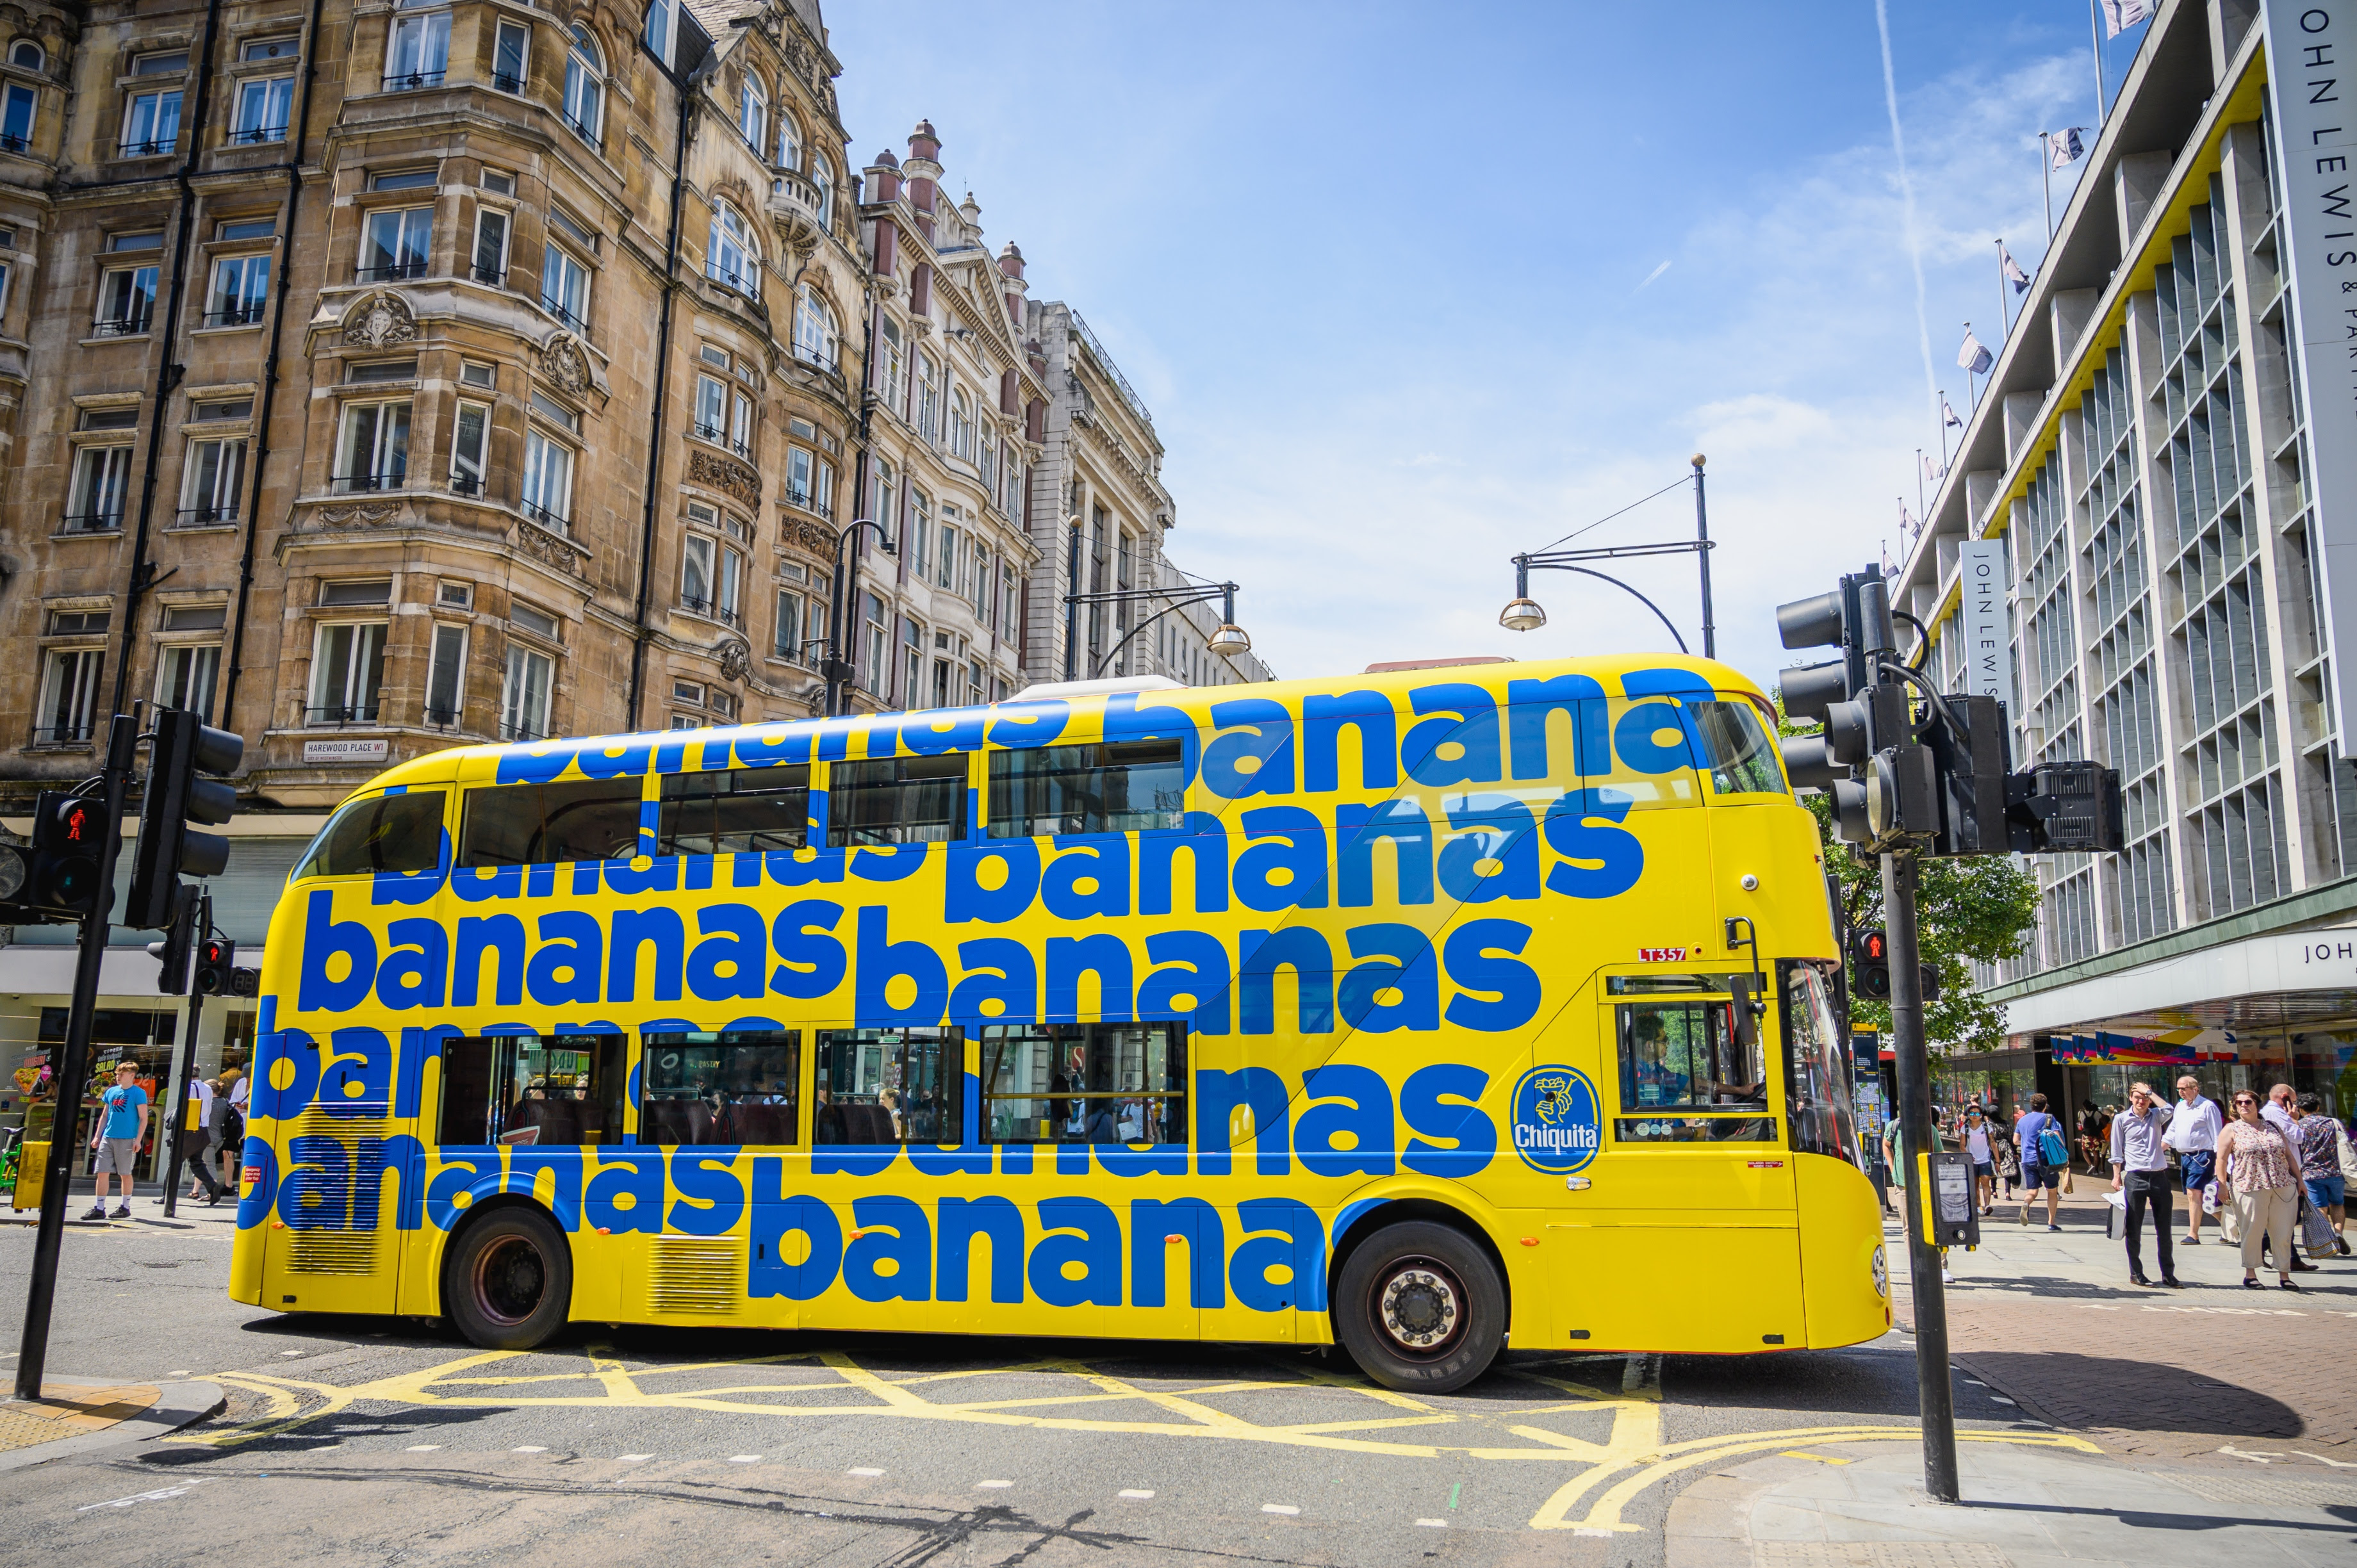 Chiquita Iconic London Bus 4.jpg